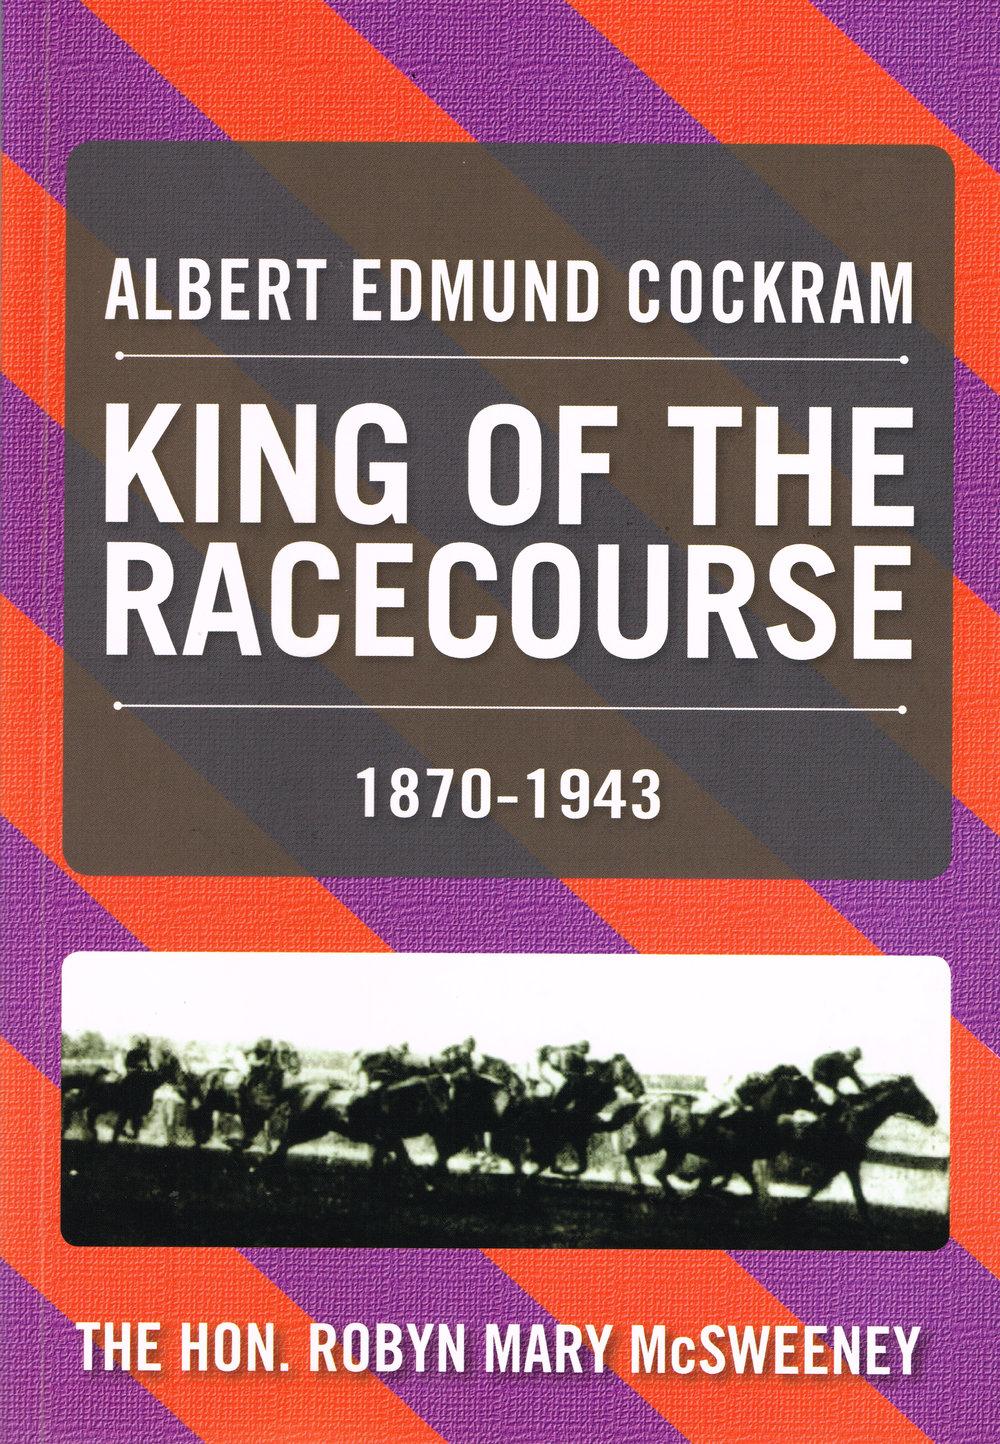 King_of_the Racecourse.jpg